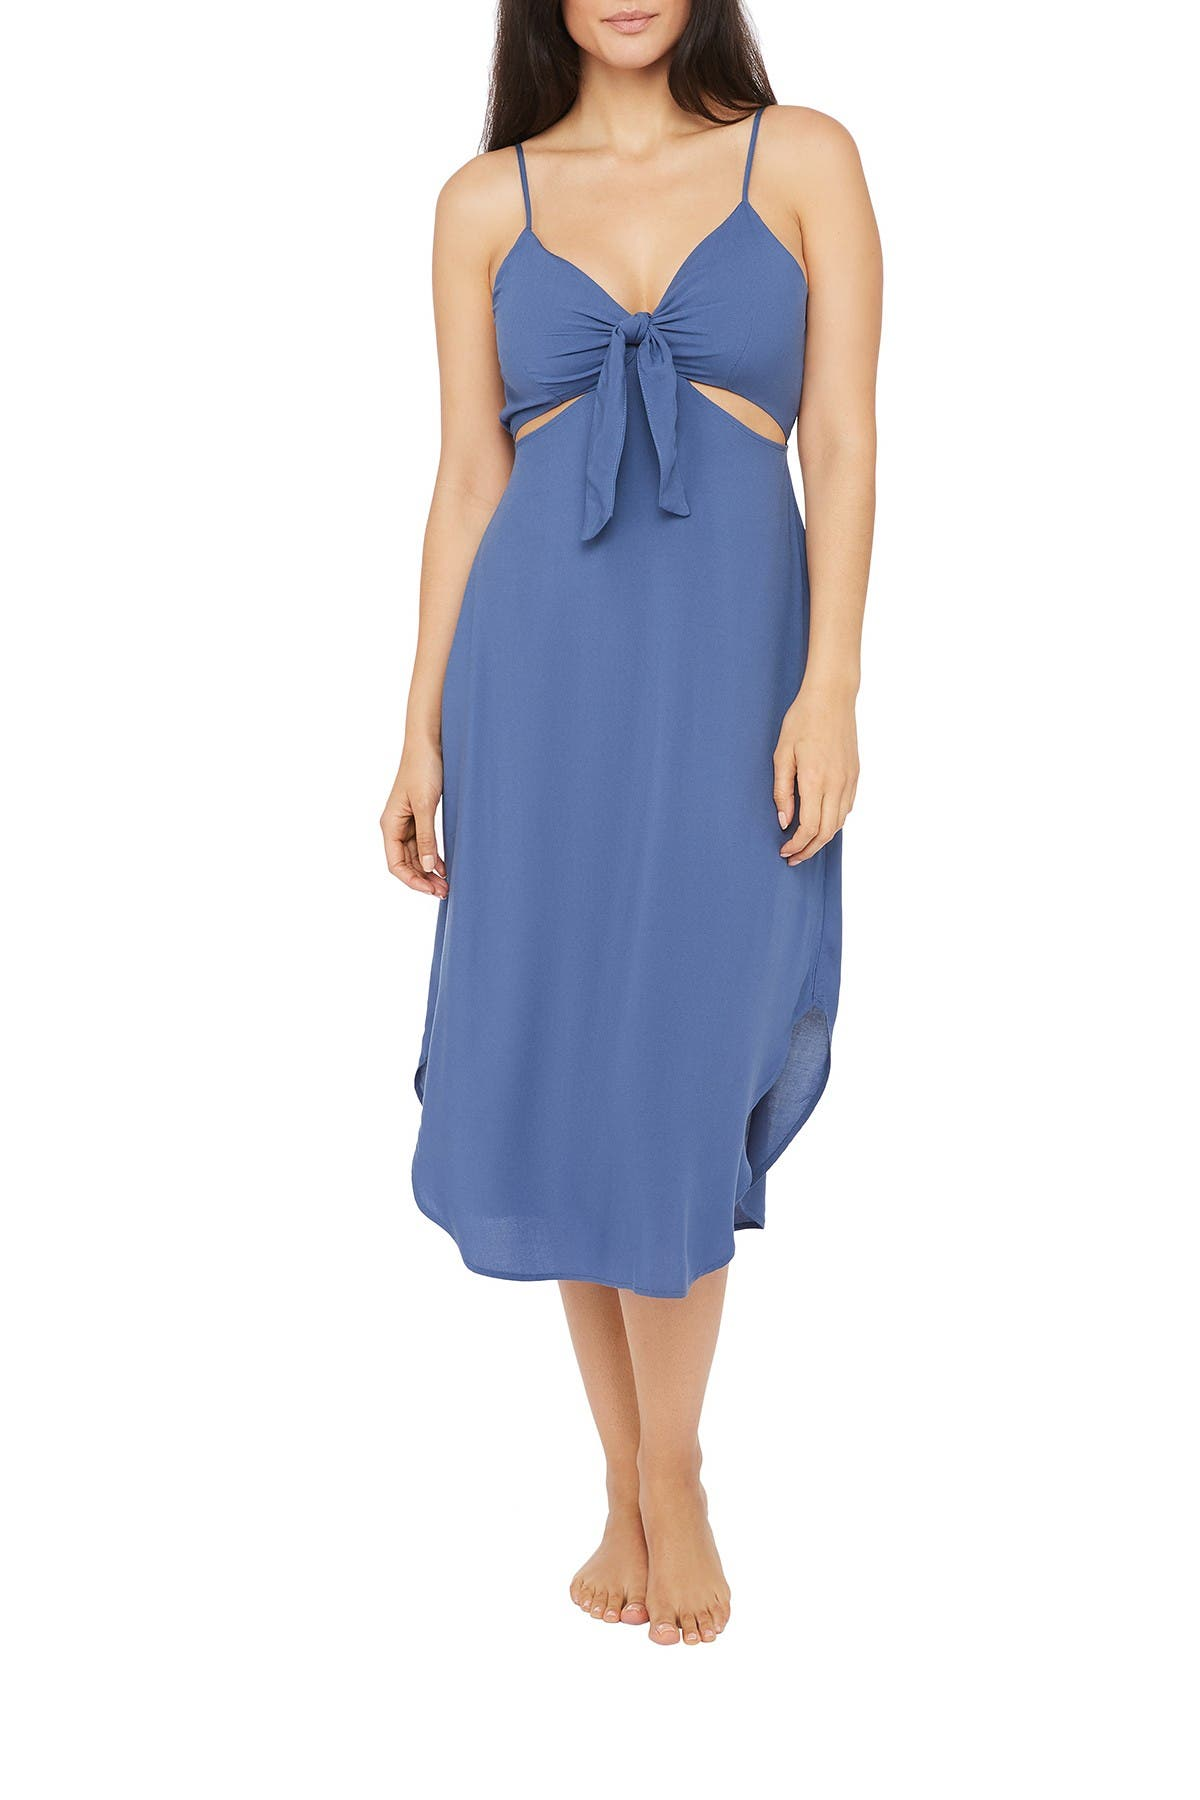 Image of La Blanca Swimwear Front Tie Cover Up Dress